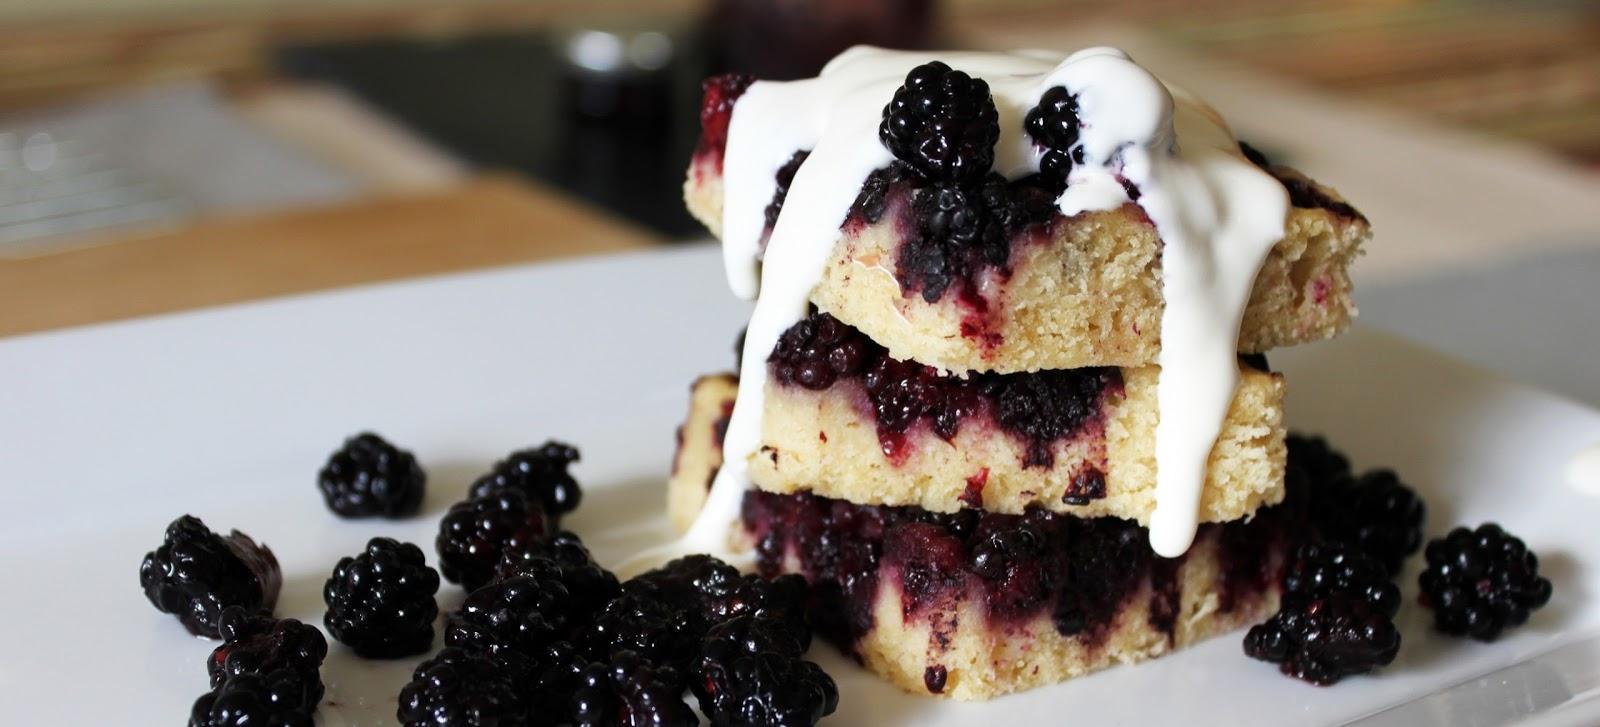 Blackberry Cake: HealthierCake Recipe